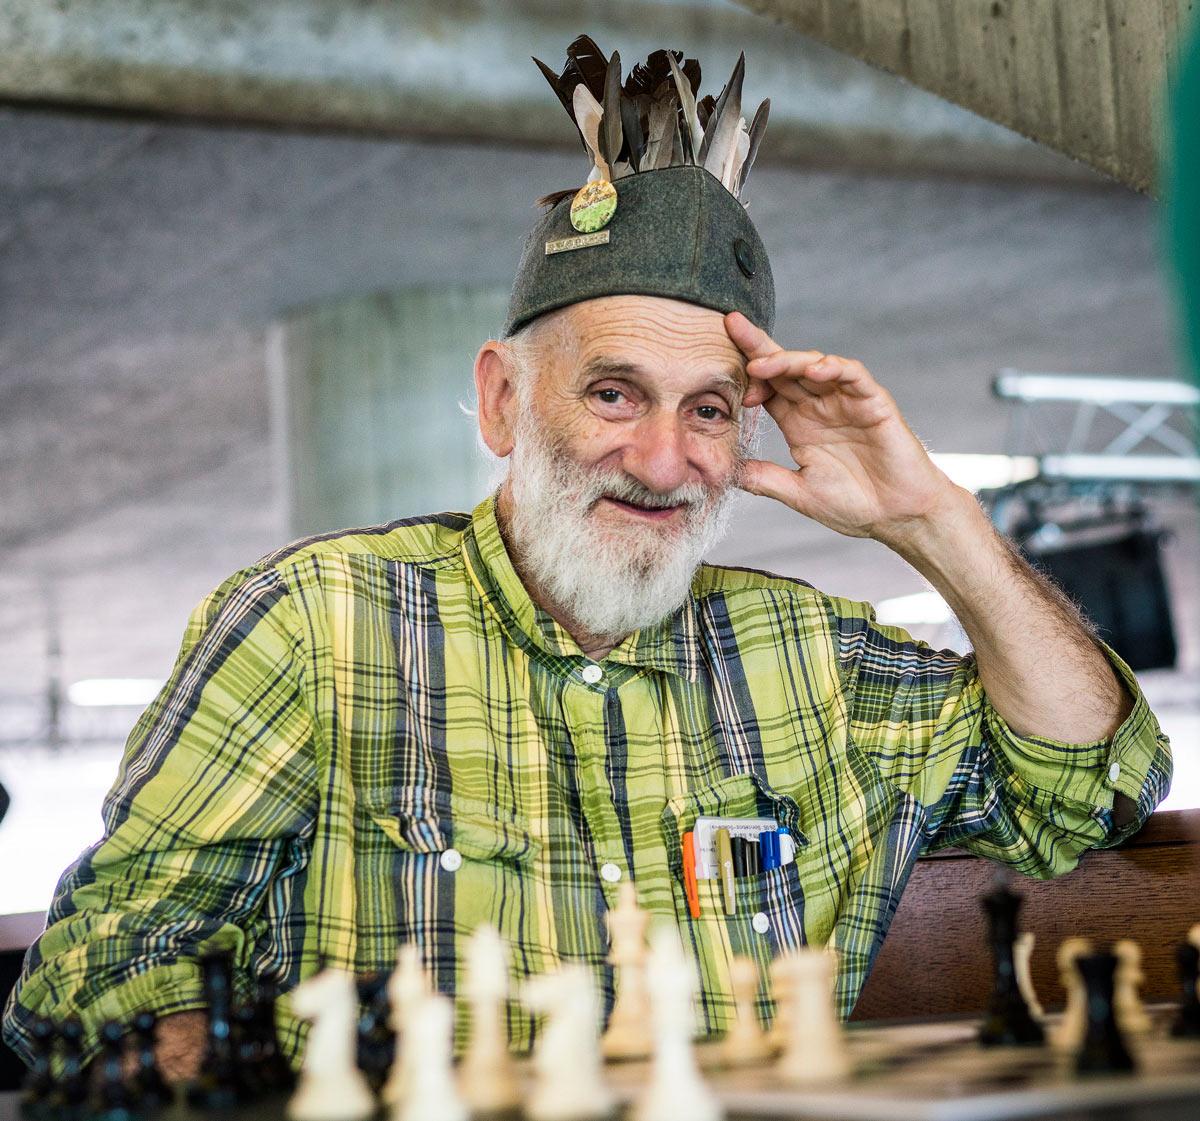 Шахматный любитель со стажем | Фото: Симон Бохненблуст